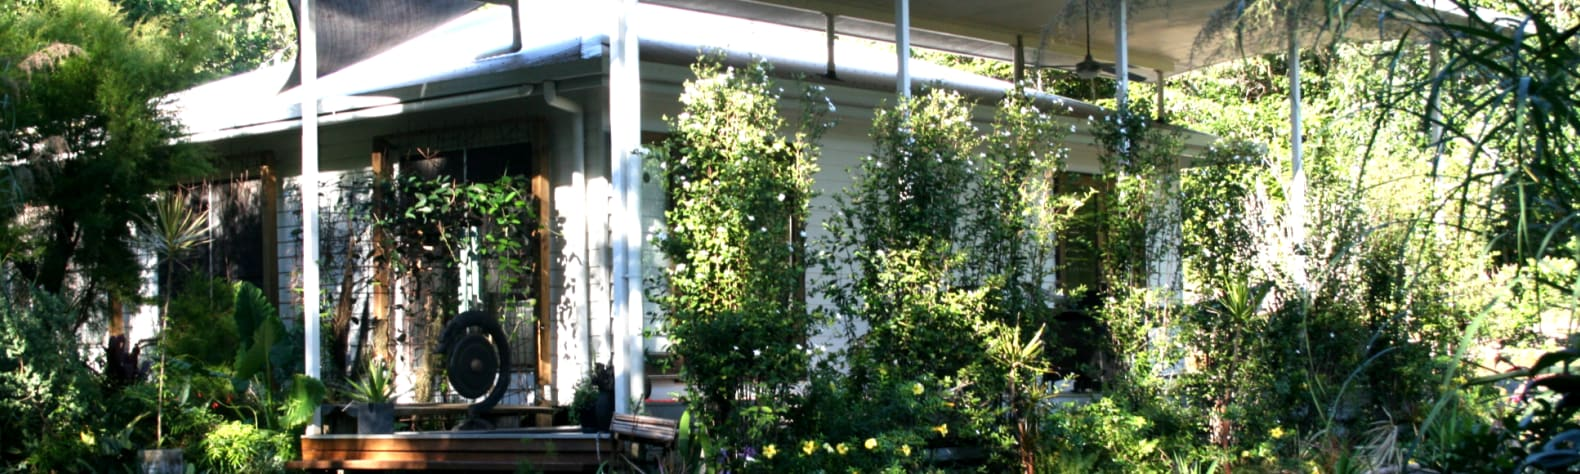 Saraswati's Oasis - Daintree Holiday Accommodation